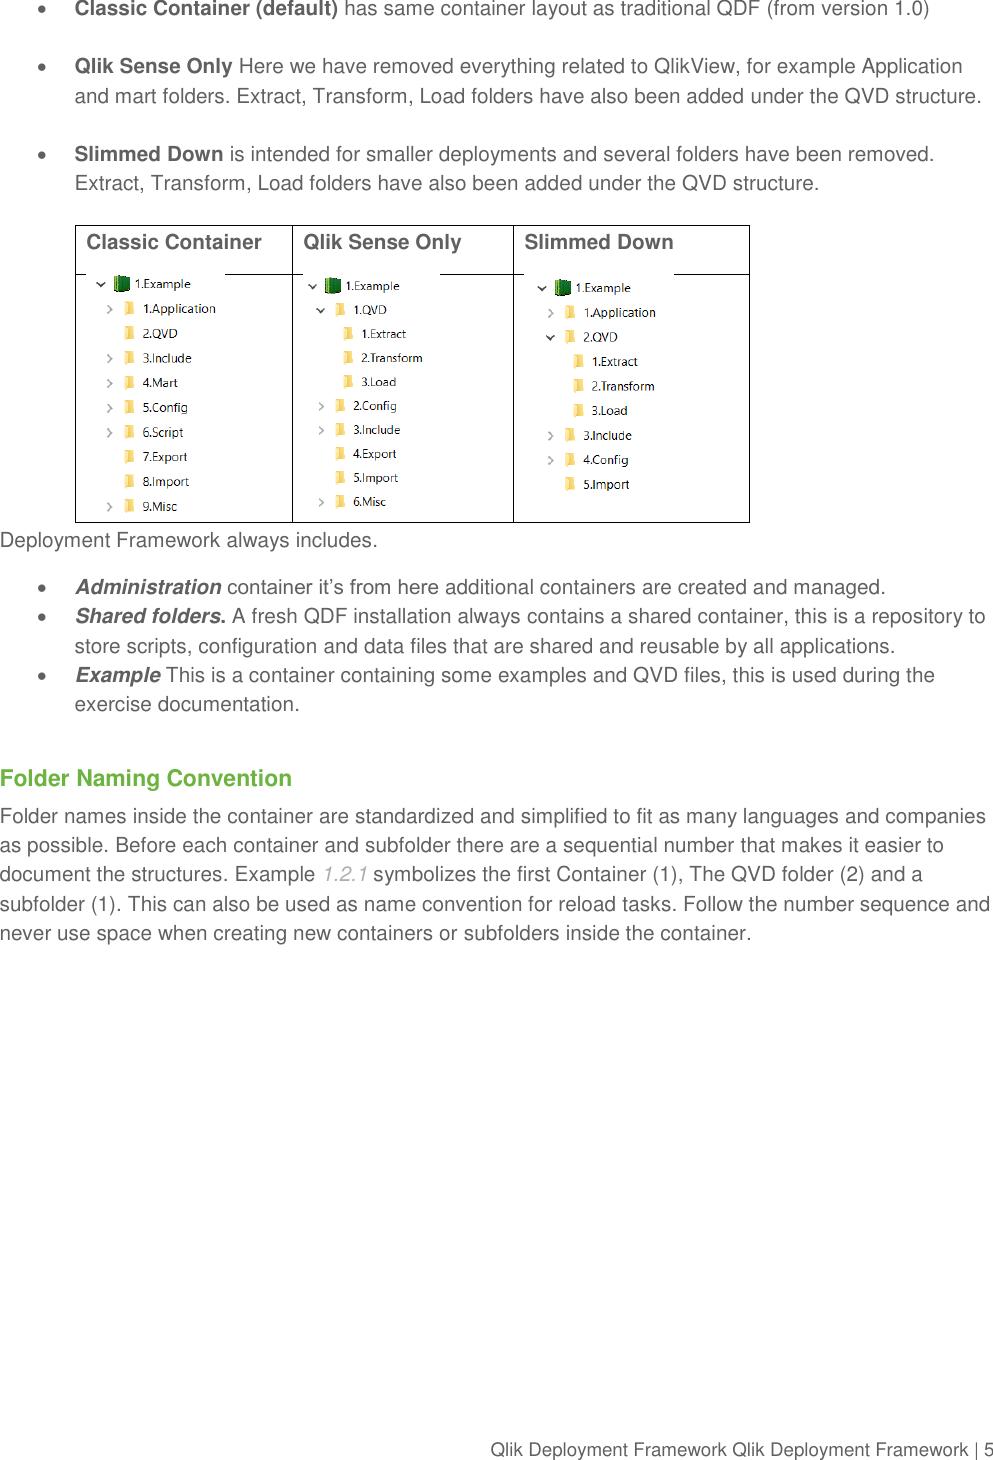 Qlik Deployment Framework Sense Development Guide